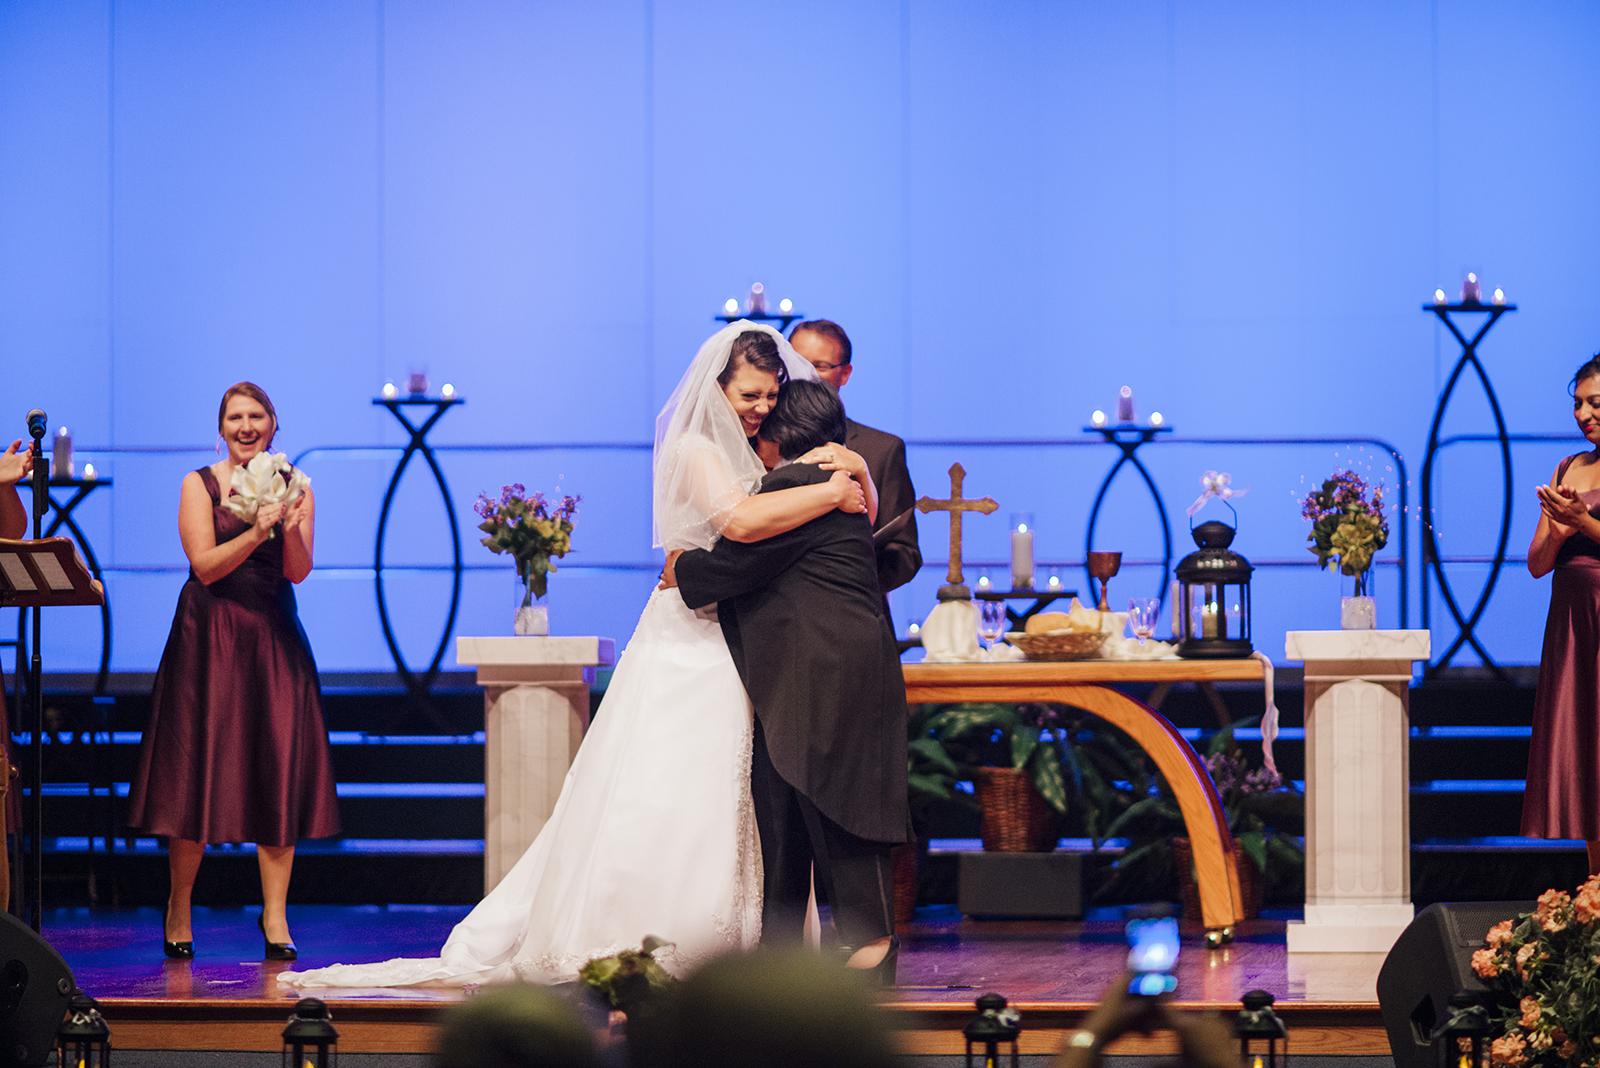 Carnefix Photography   Denver Photography   Lesbian Wedding Photography   Gay Wedding Photography   LGBT Wedding Photography